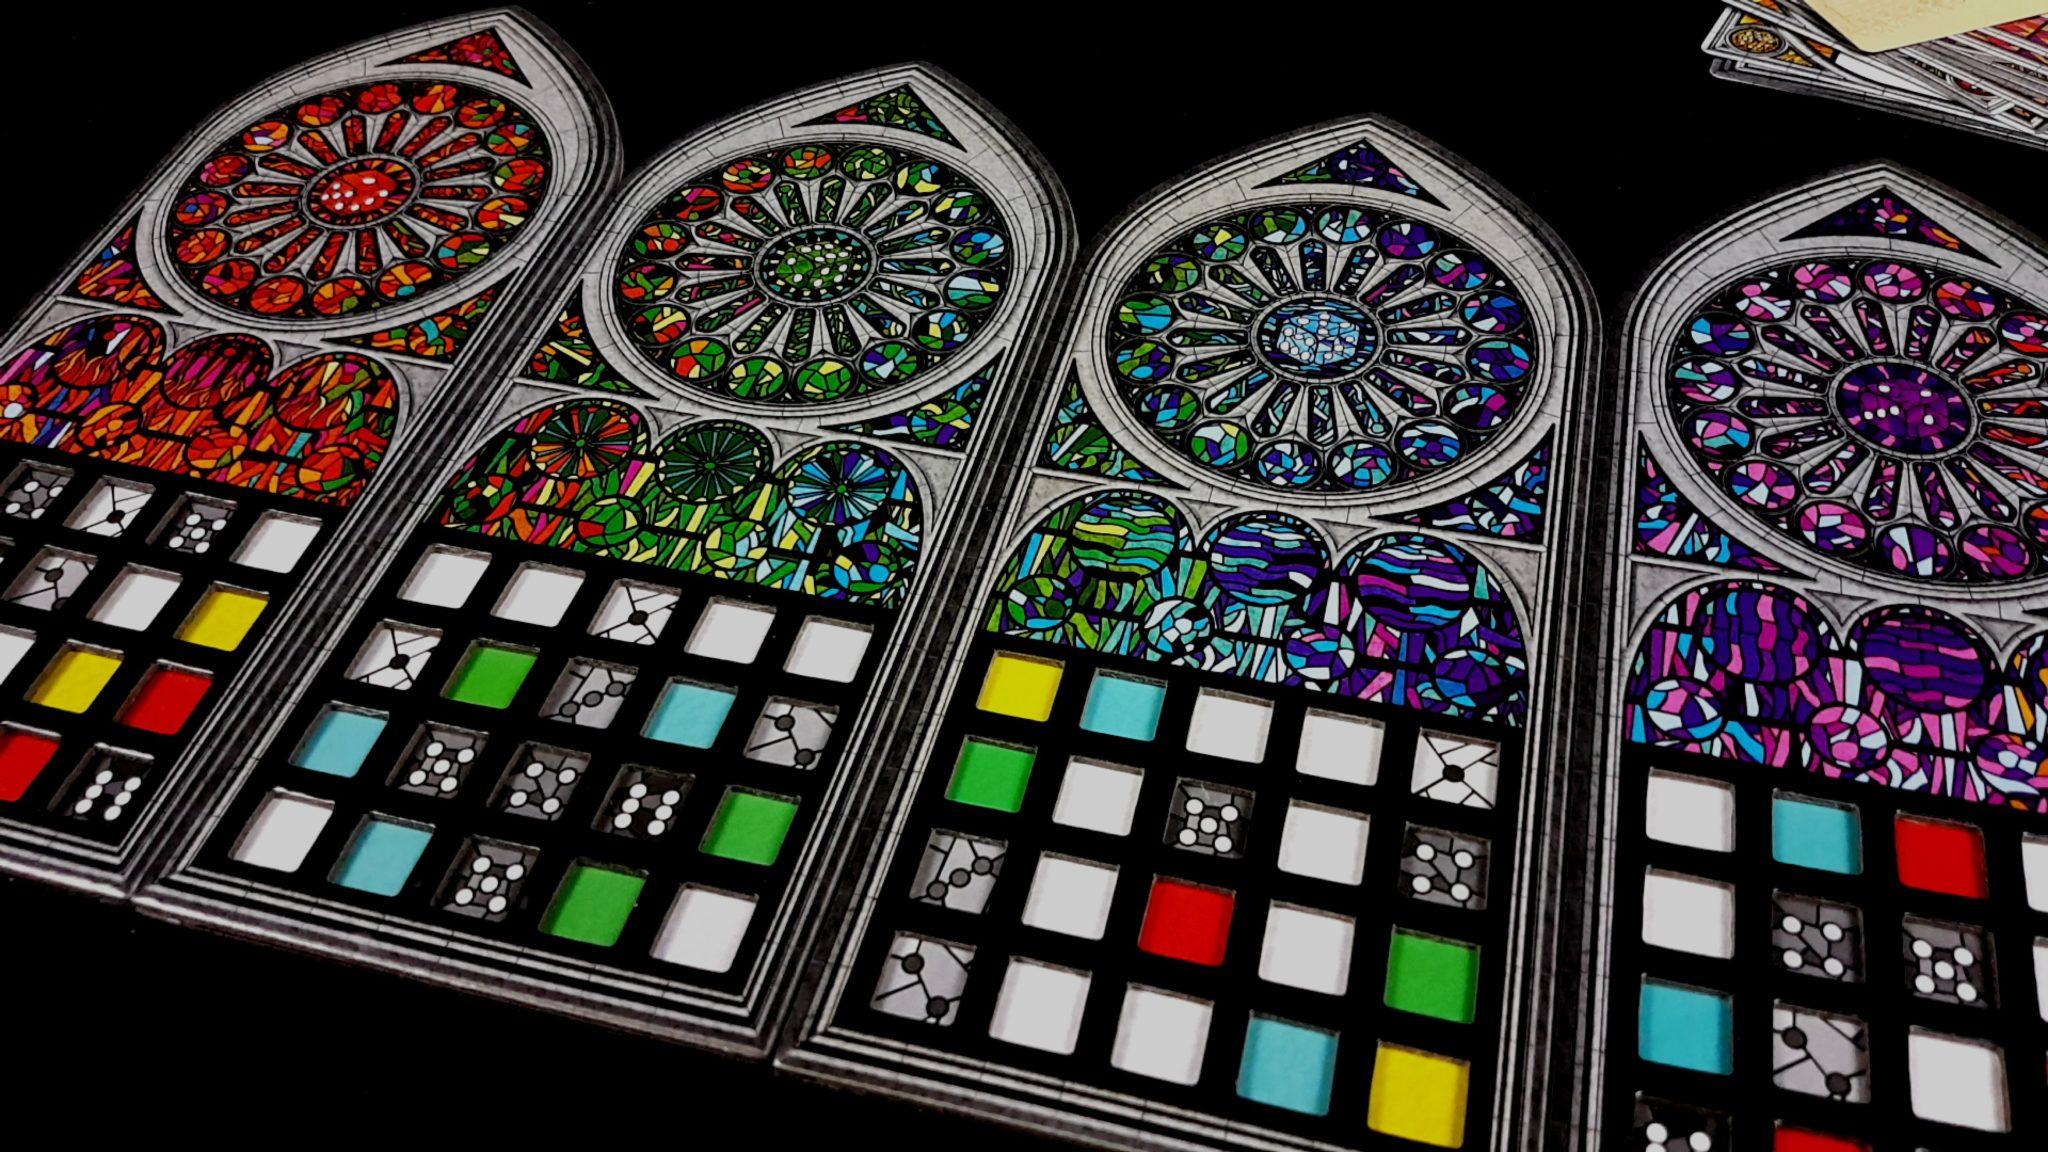 Slotted Sagrada window frames